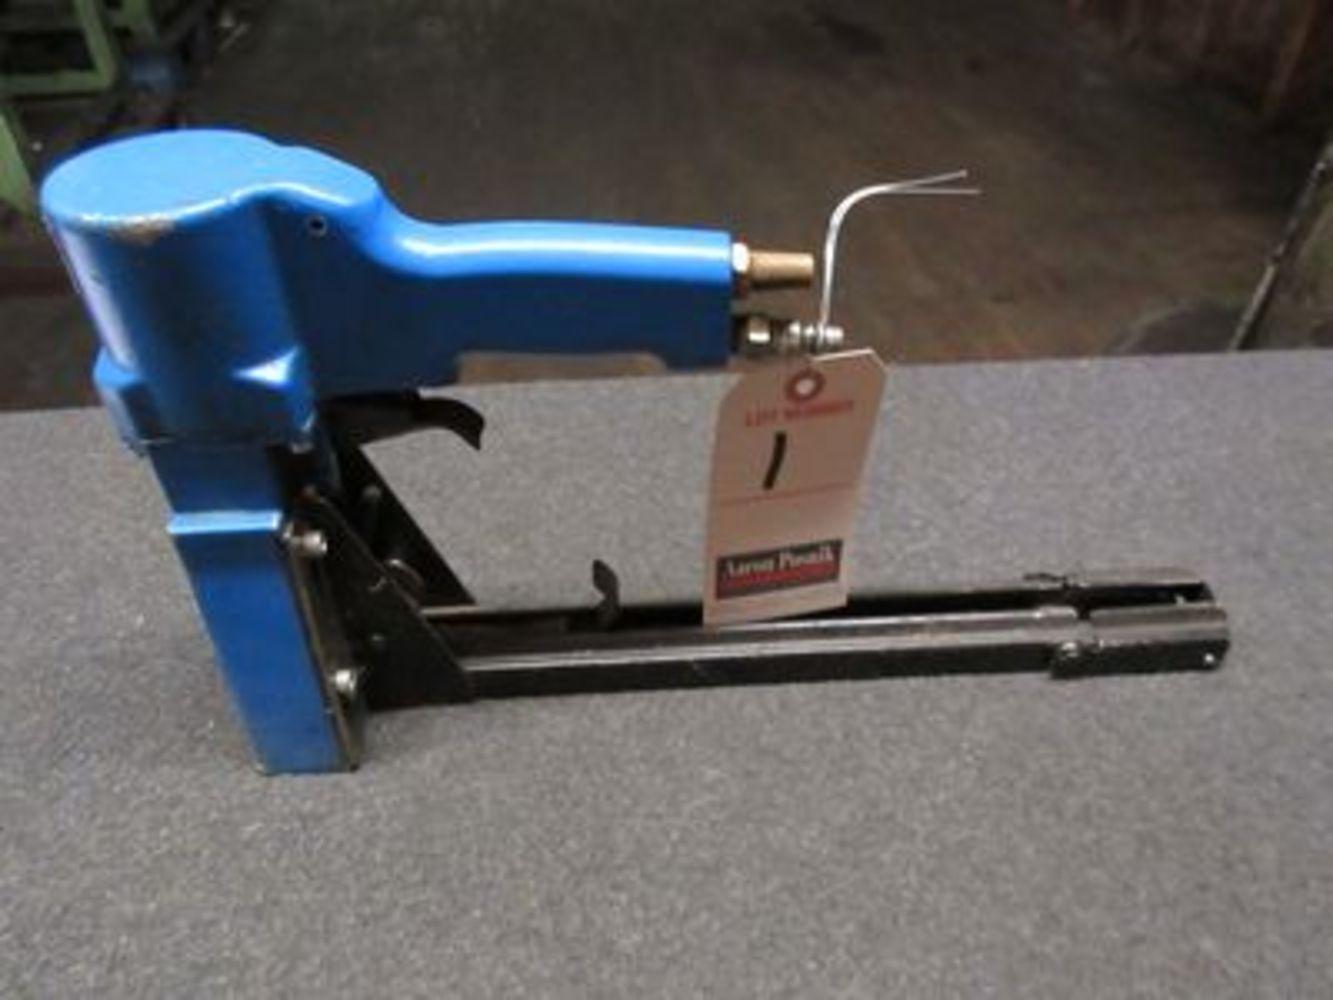 FRANCER INDUSTRIES, INC. - Duct & Pipe Manufacturer & Supplier